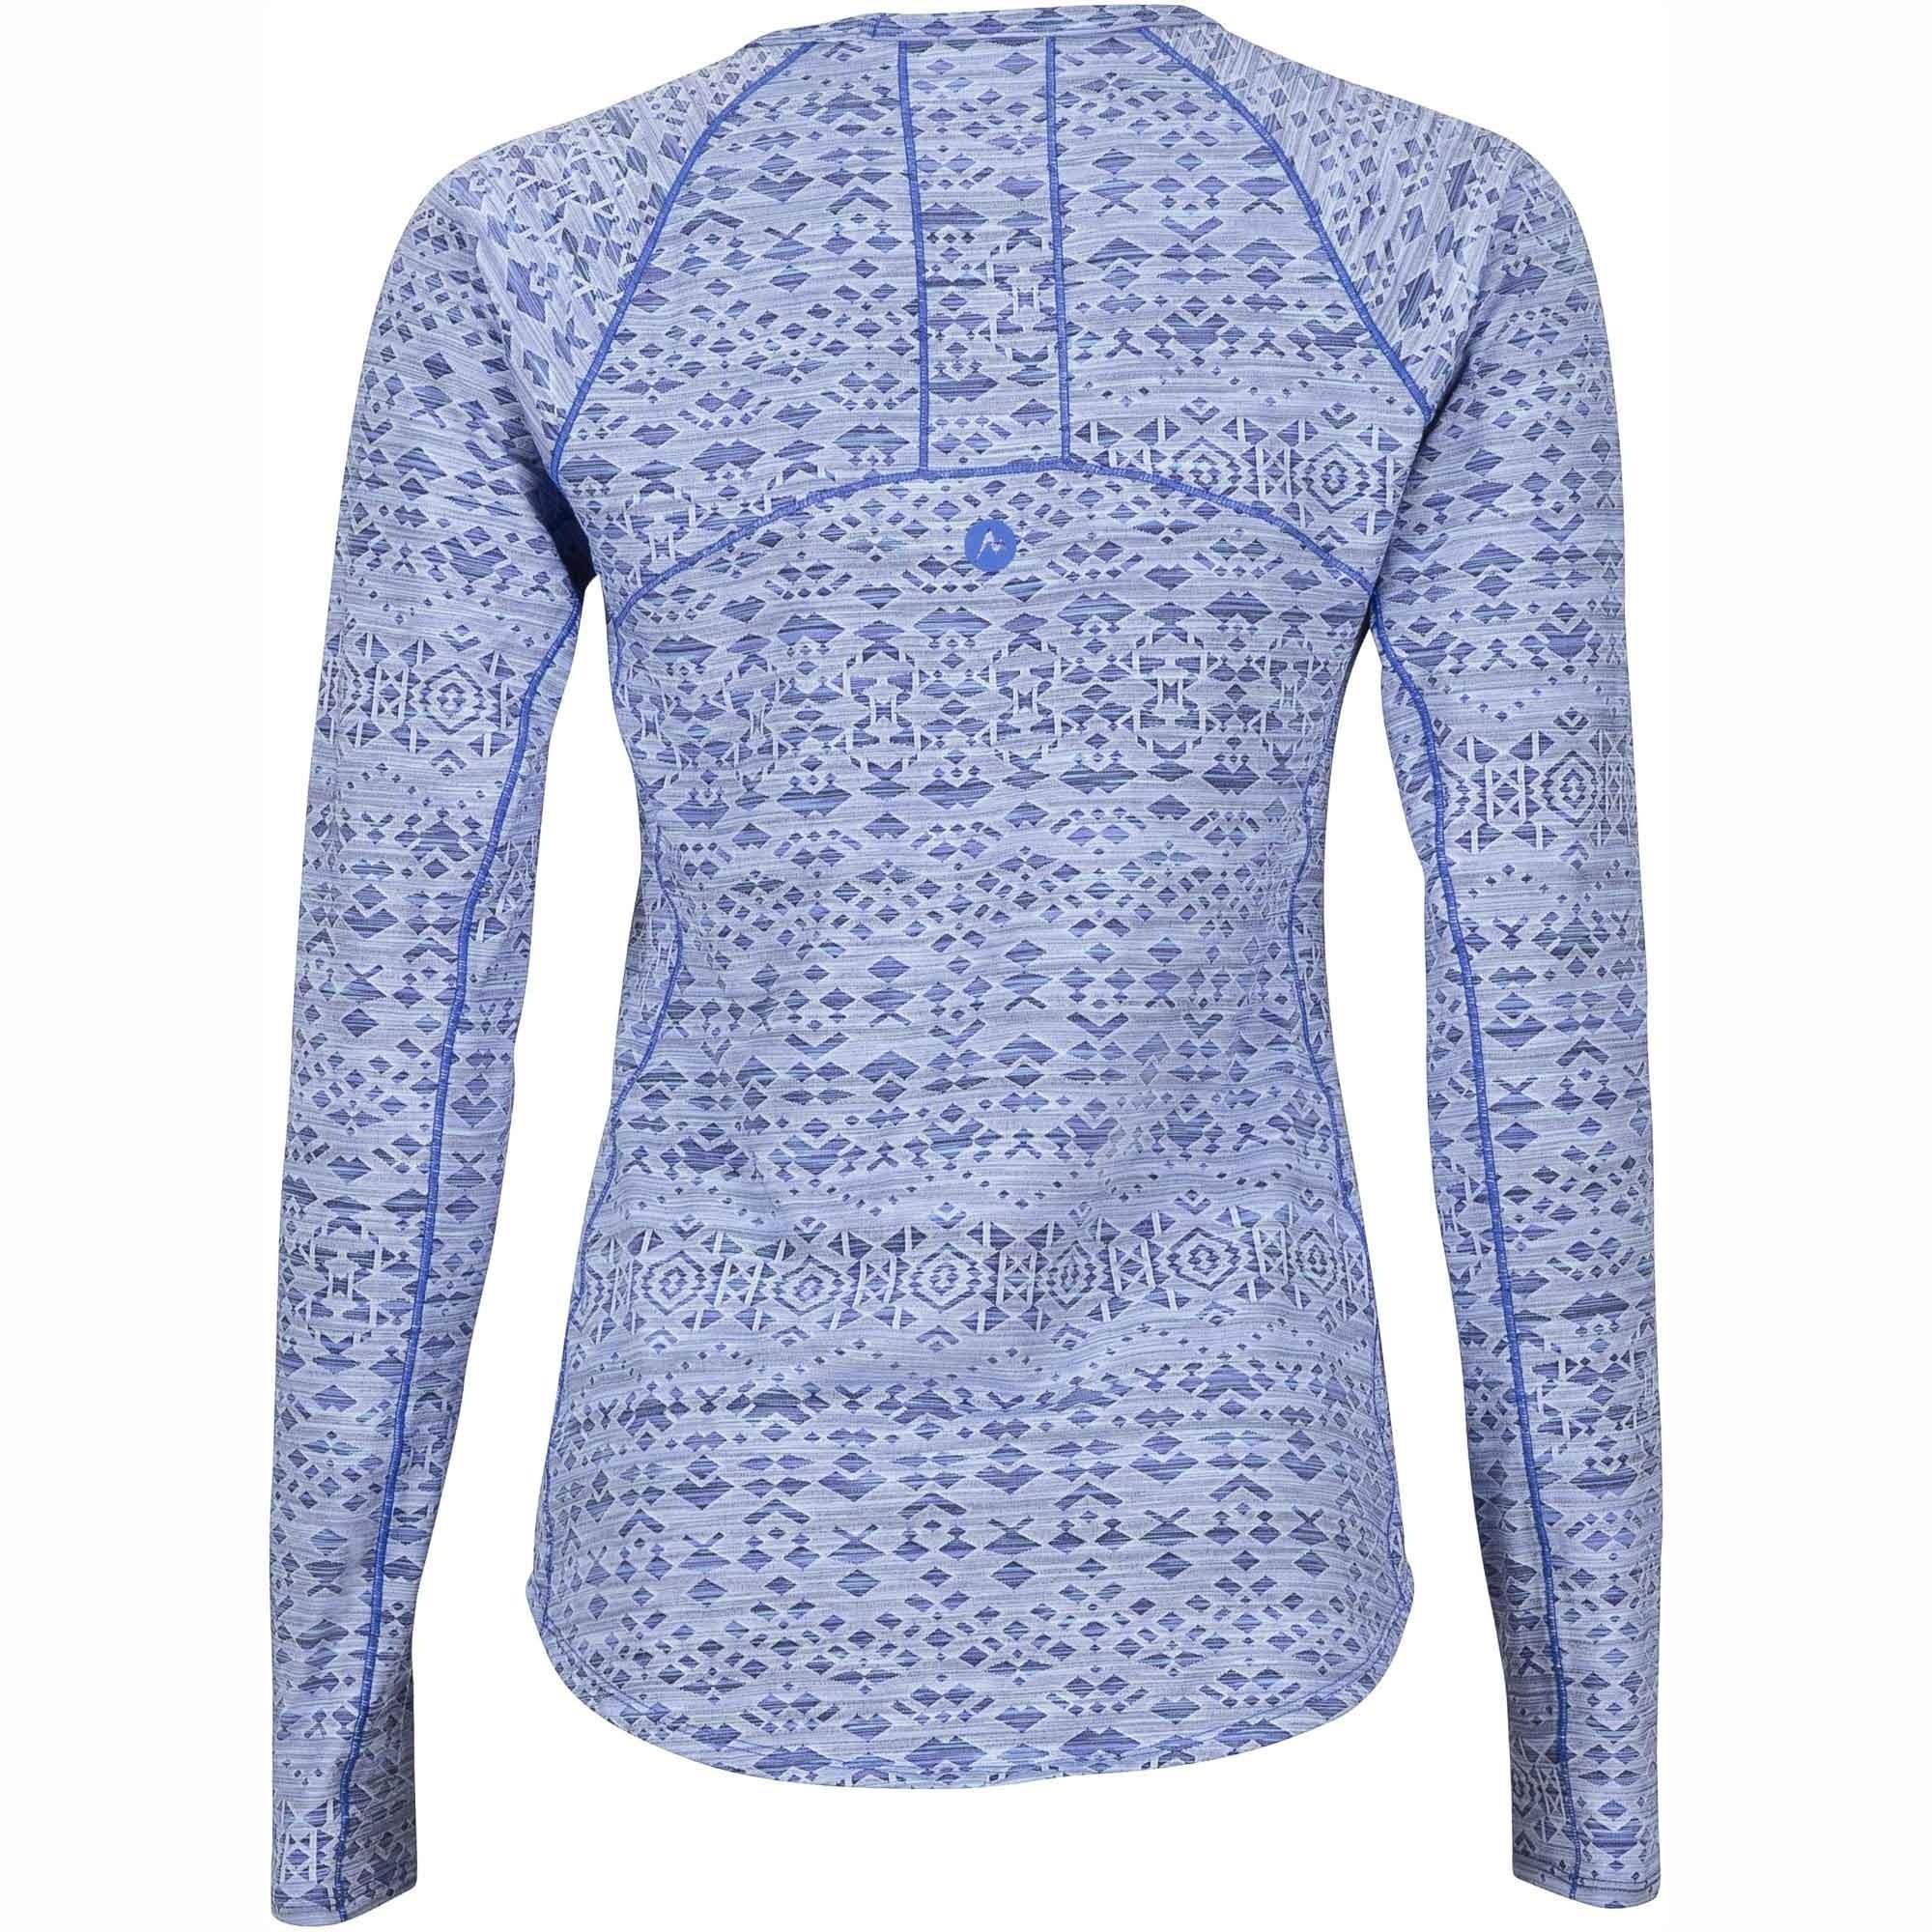 Marmot Sylvie Long Sleeved Top - Lilac - Back